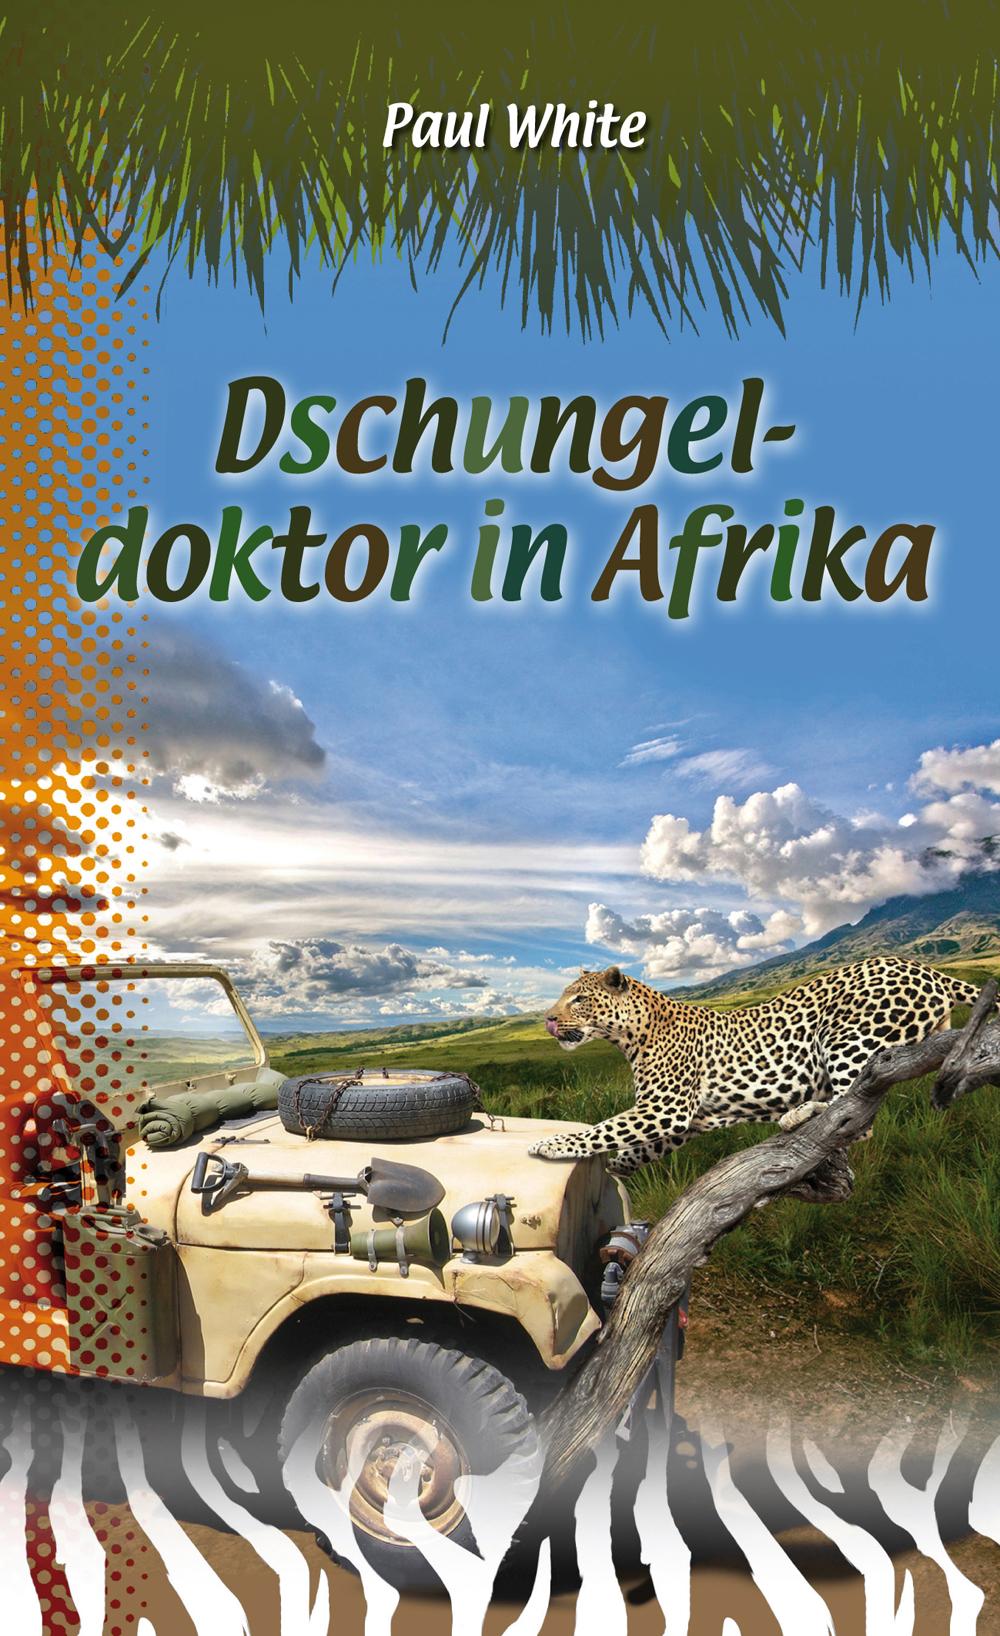 CLV_dschungeldoktor-in-afrika_paul-white_256120_1